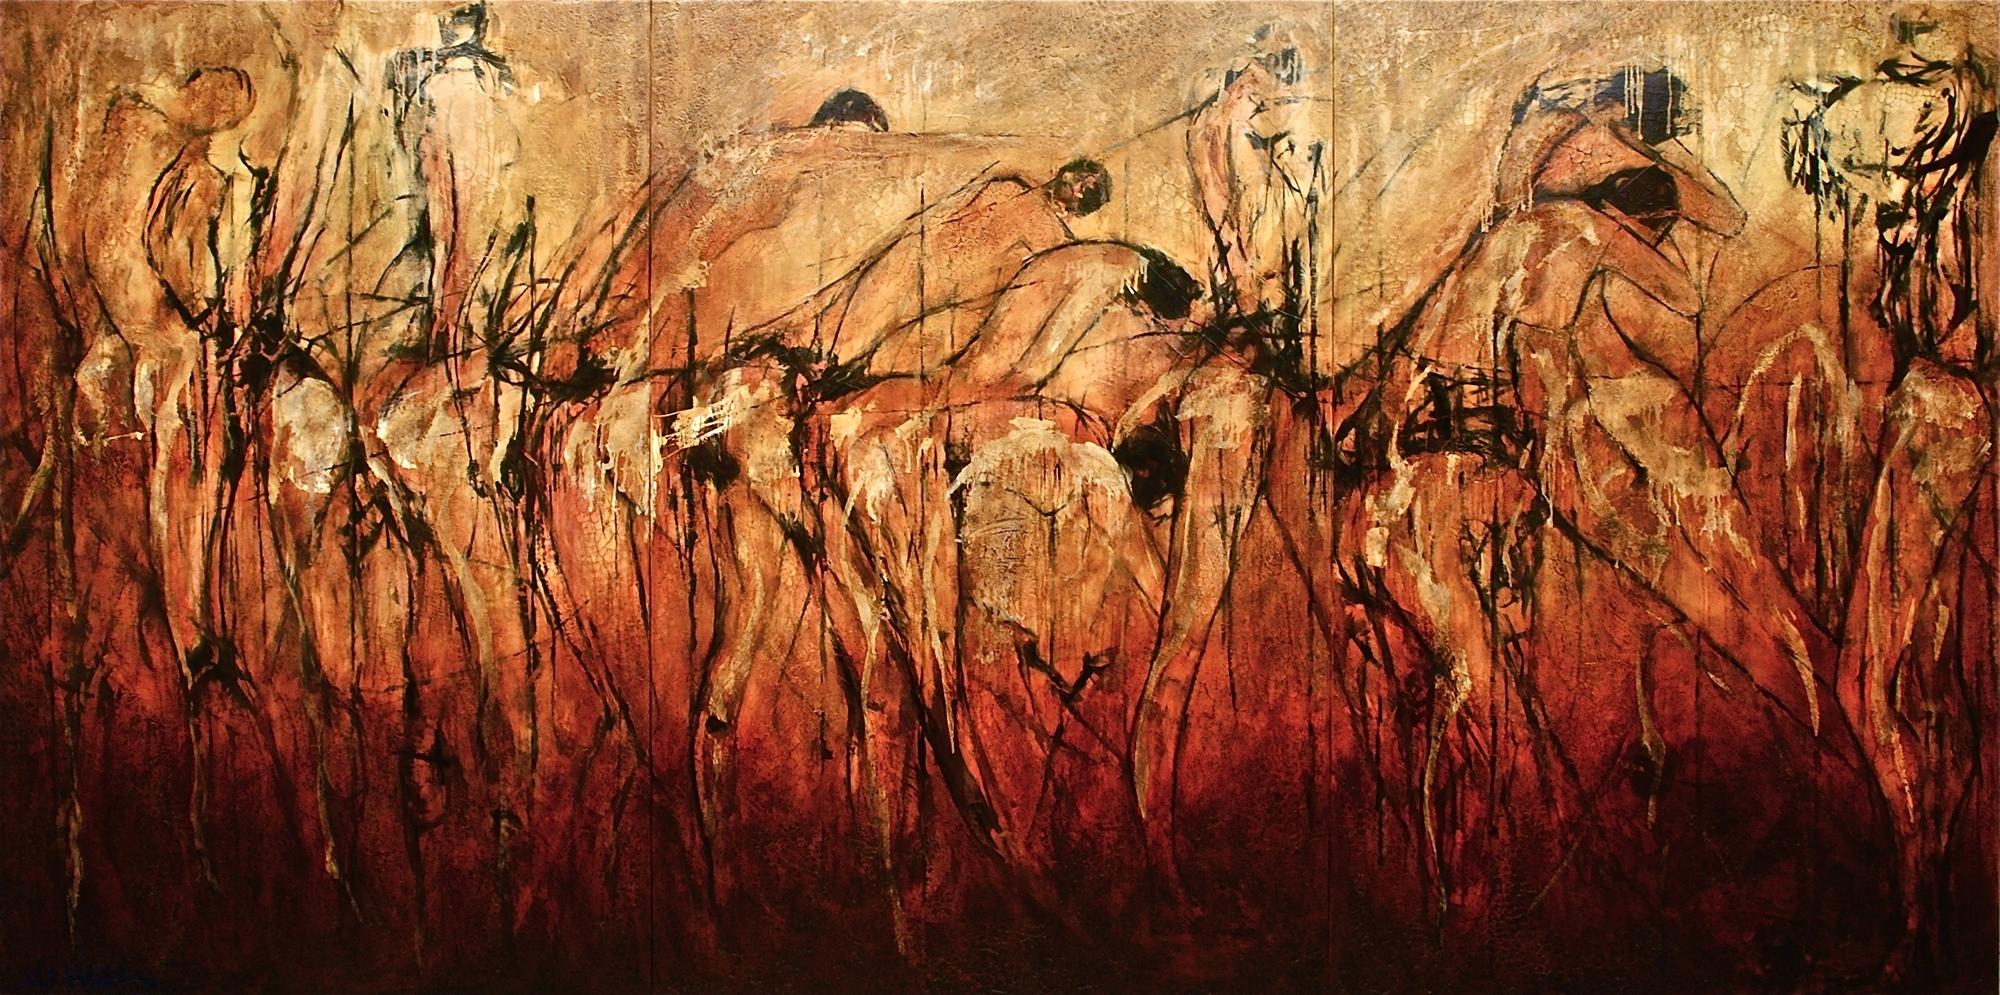 Judgement of Paris by Gary Welton